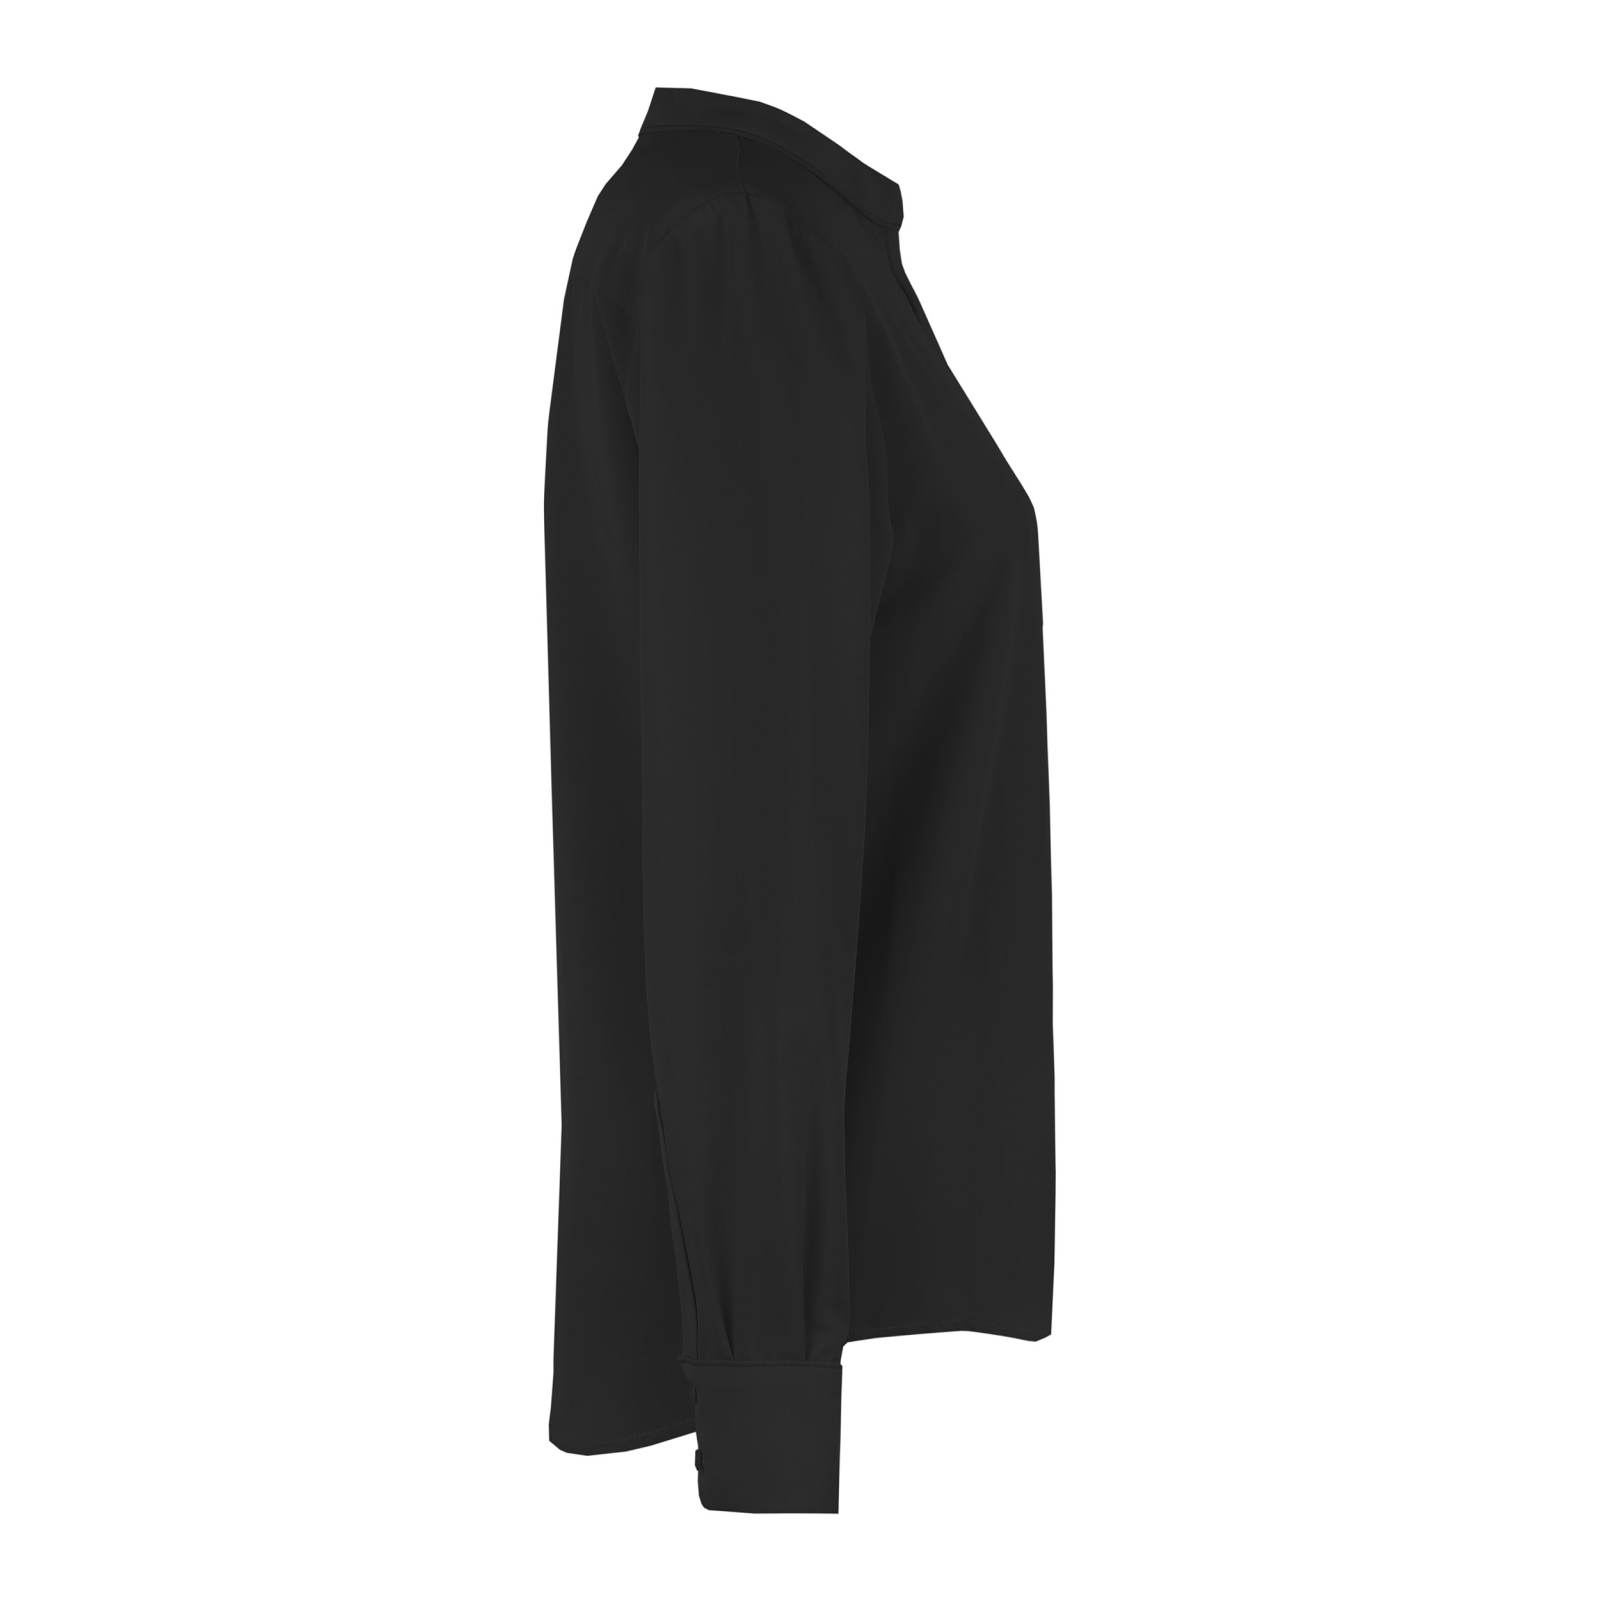 شومیز زنانه زیبو مدل 011315-BLACK -  - 3